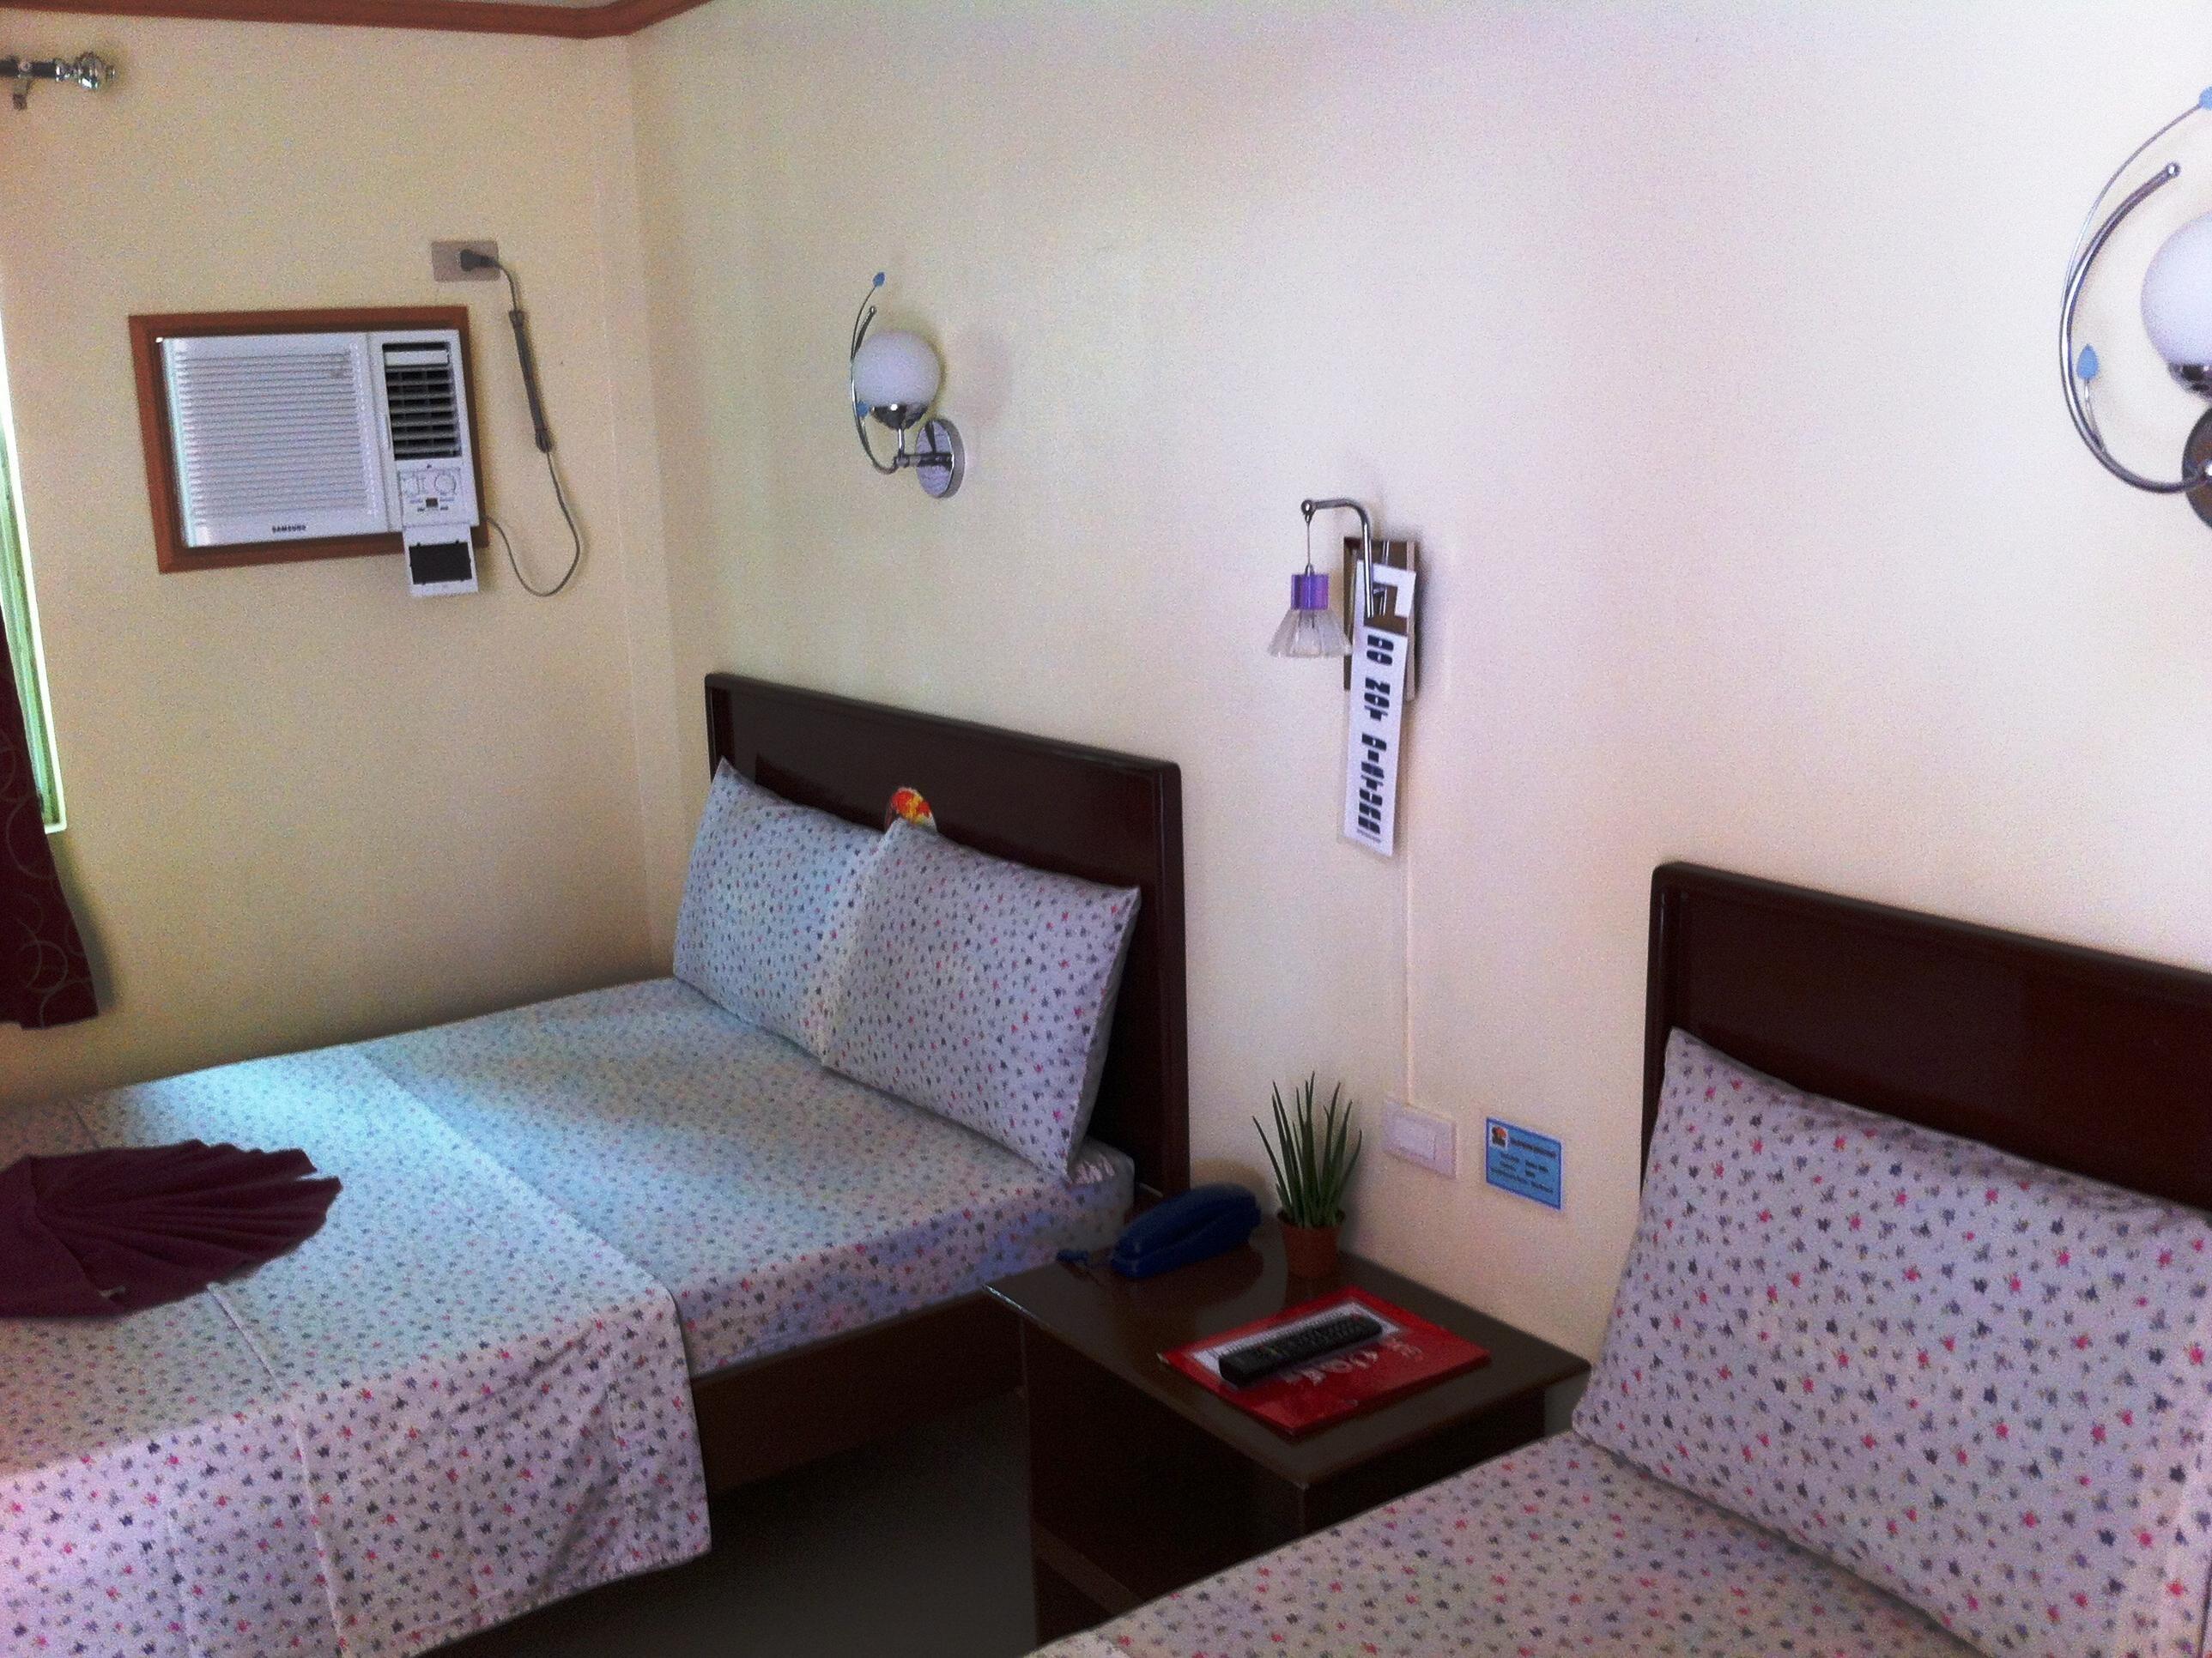 Raymen Beach Resort Guimaras Island Philippines Home Decor Furniture Hotel